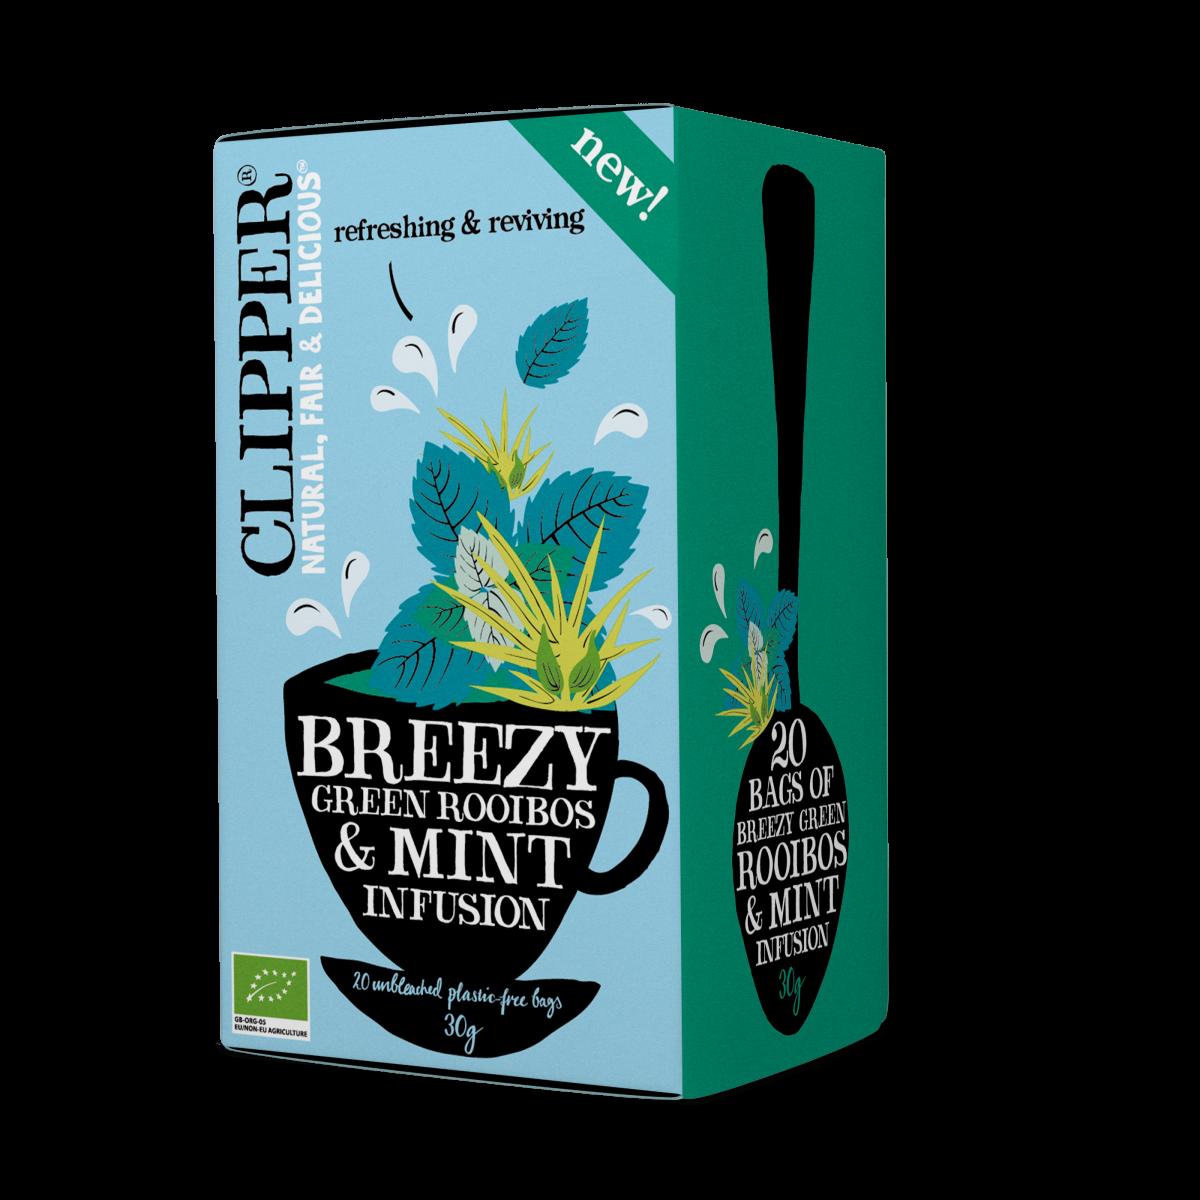 Breezy Green Rooibos Mint